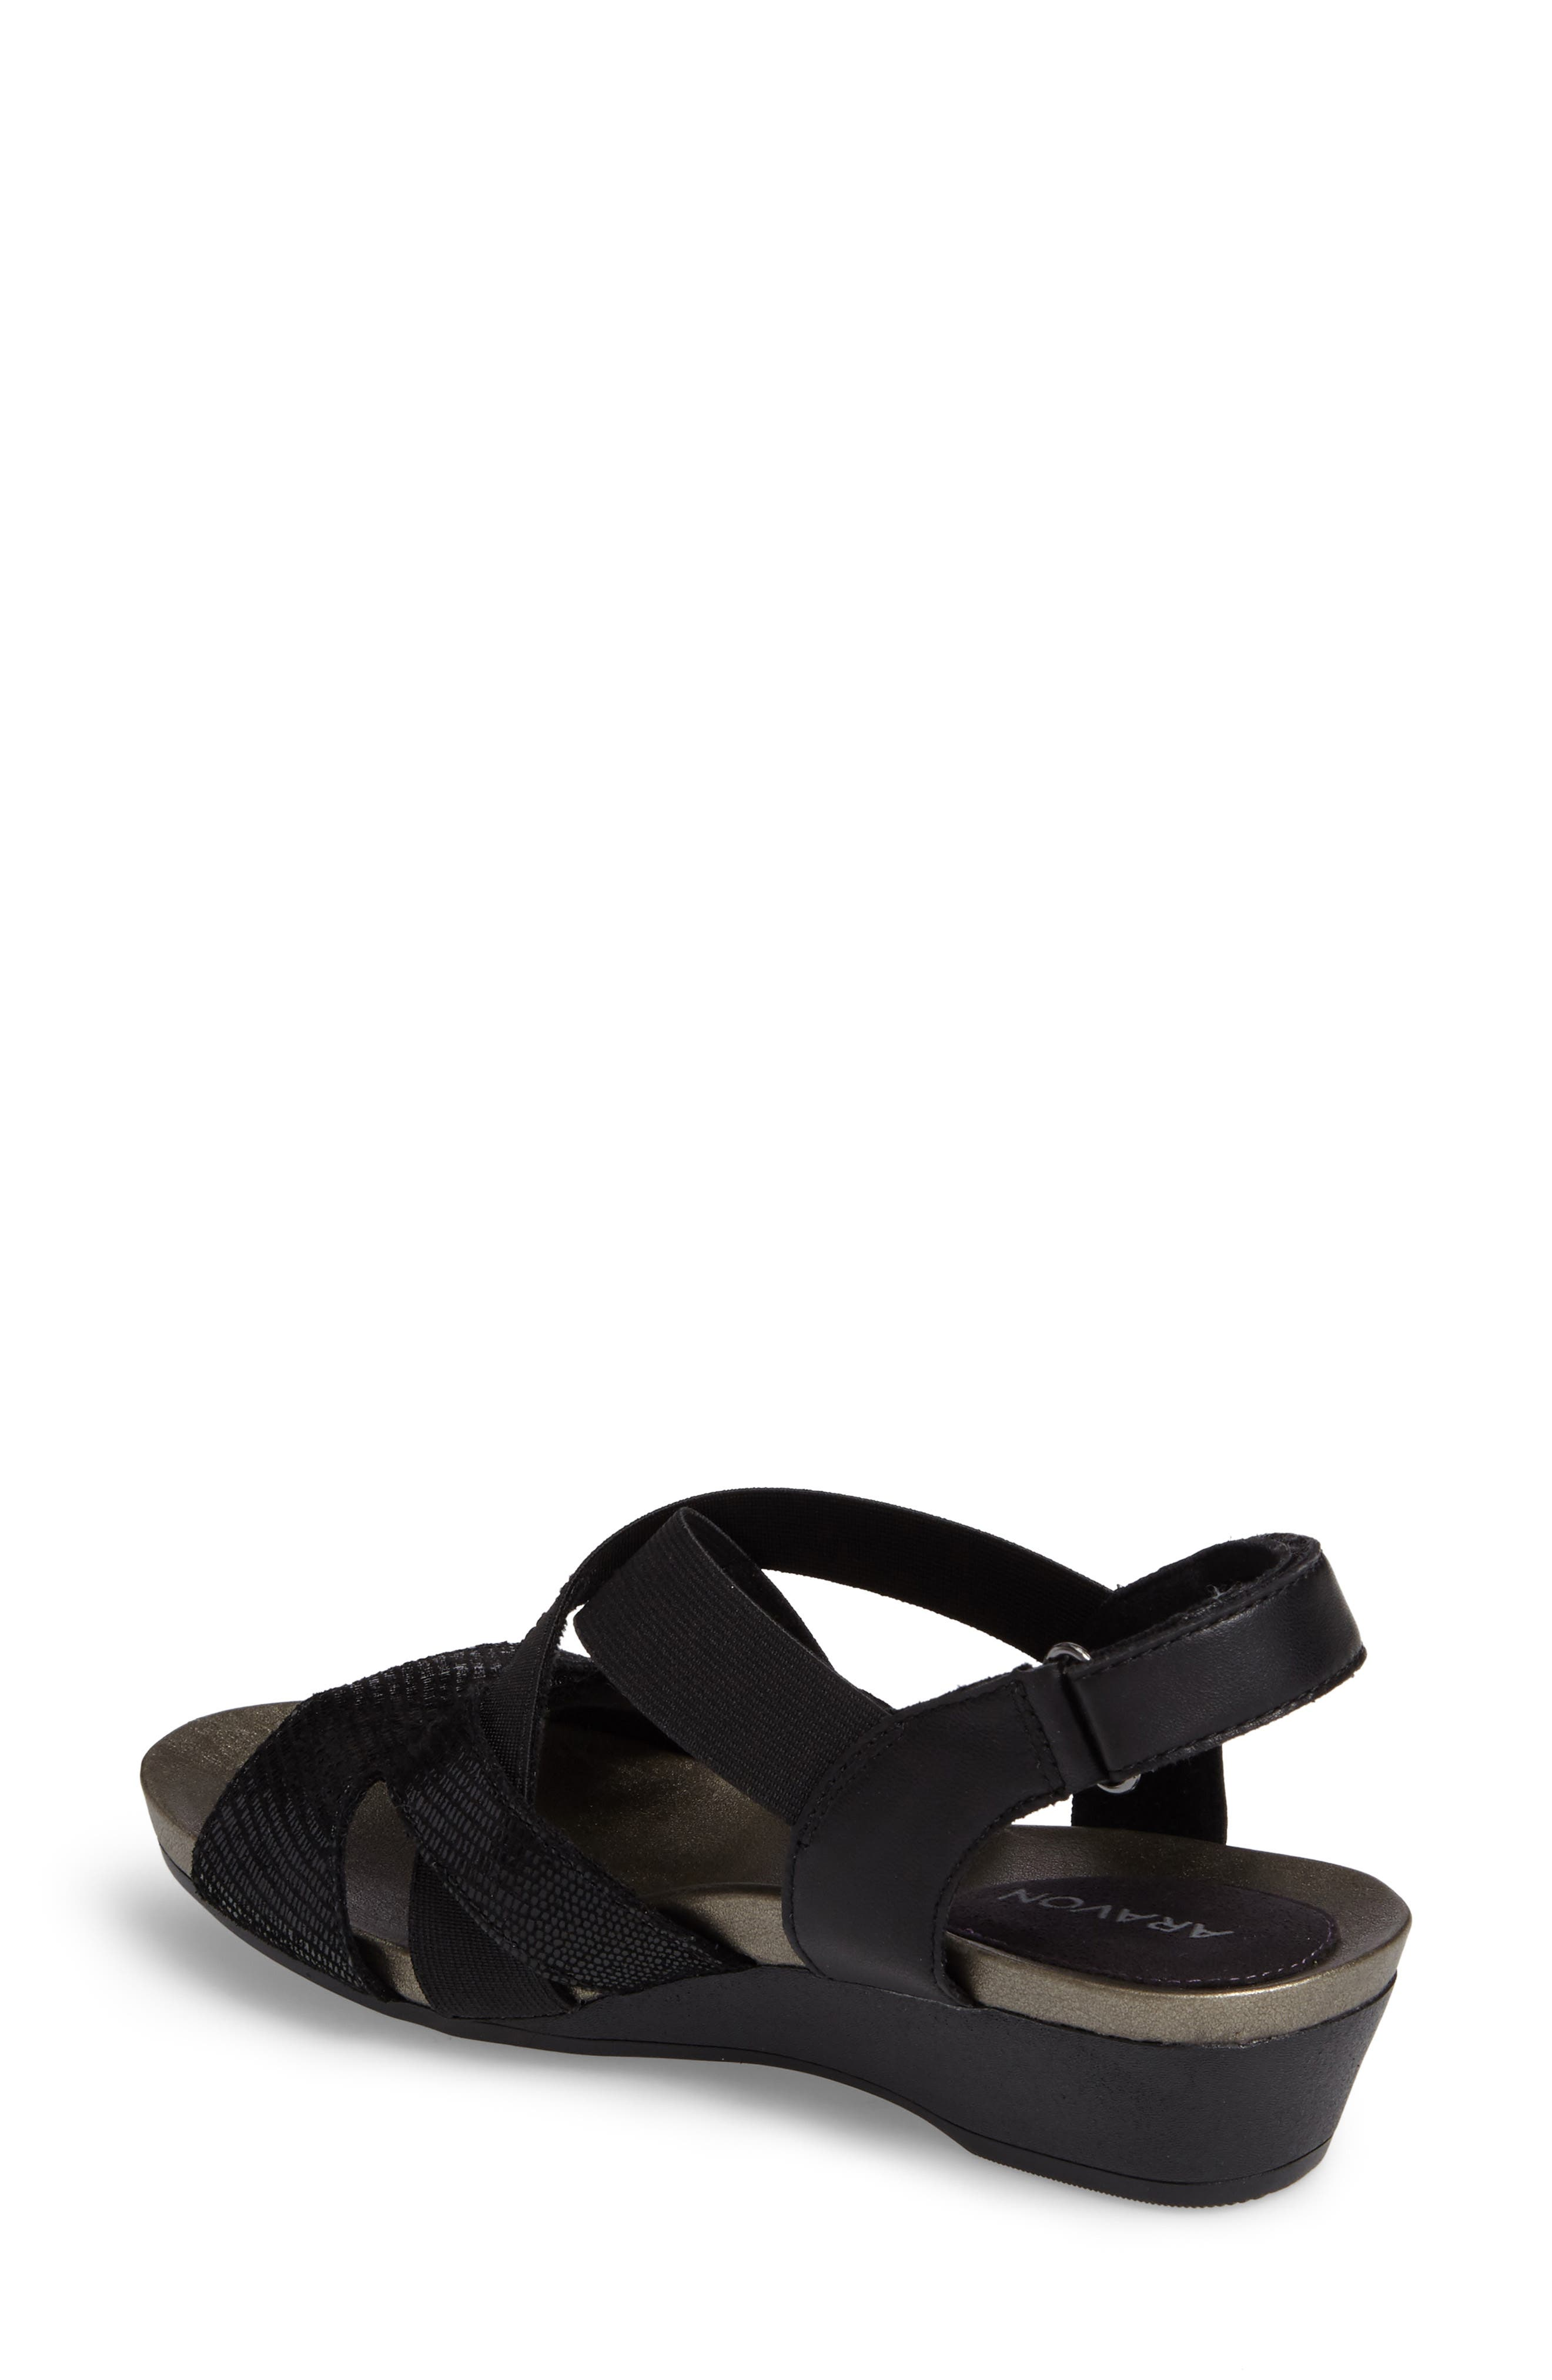 Standon Cross Strap Sandal,                             Alternate thumbnail 2, color,                             001